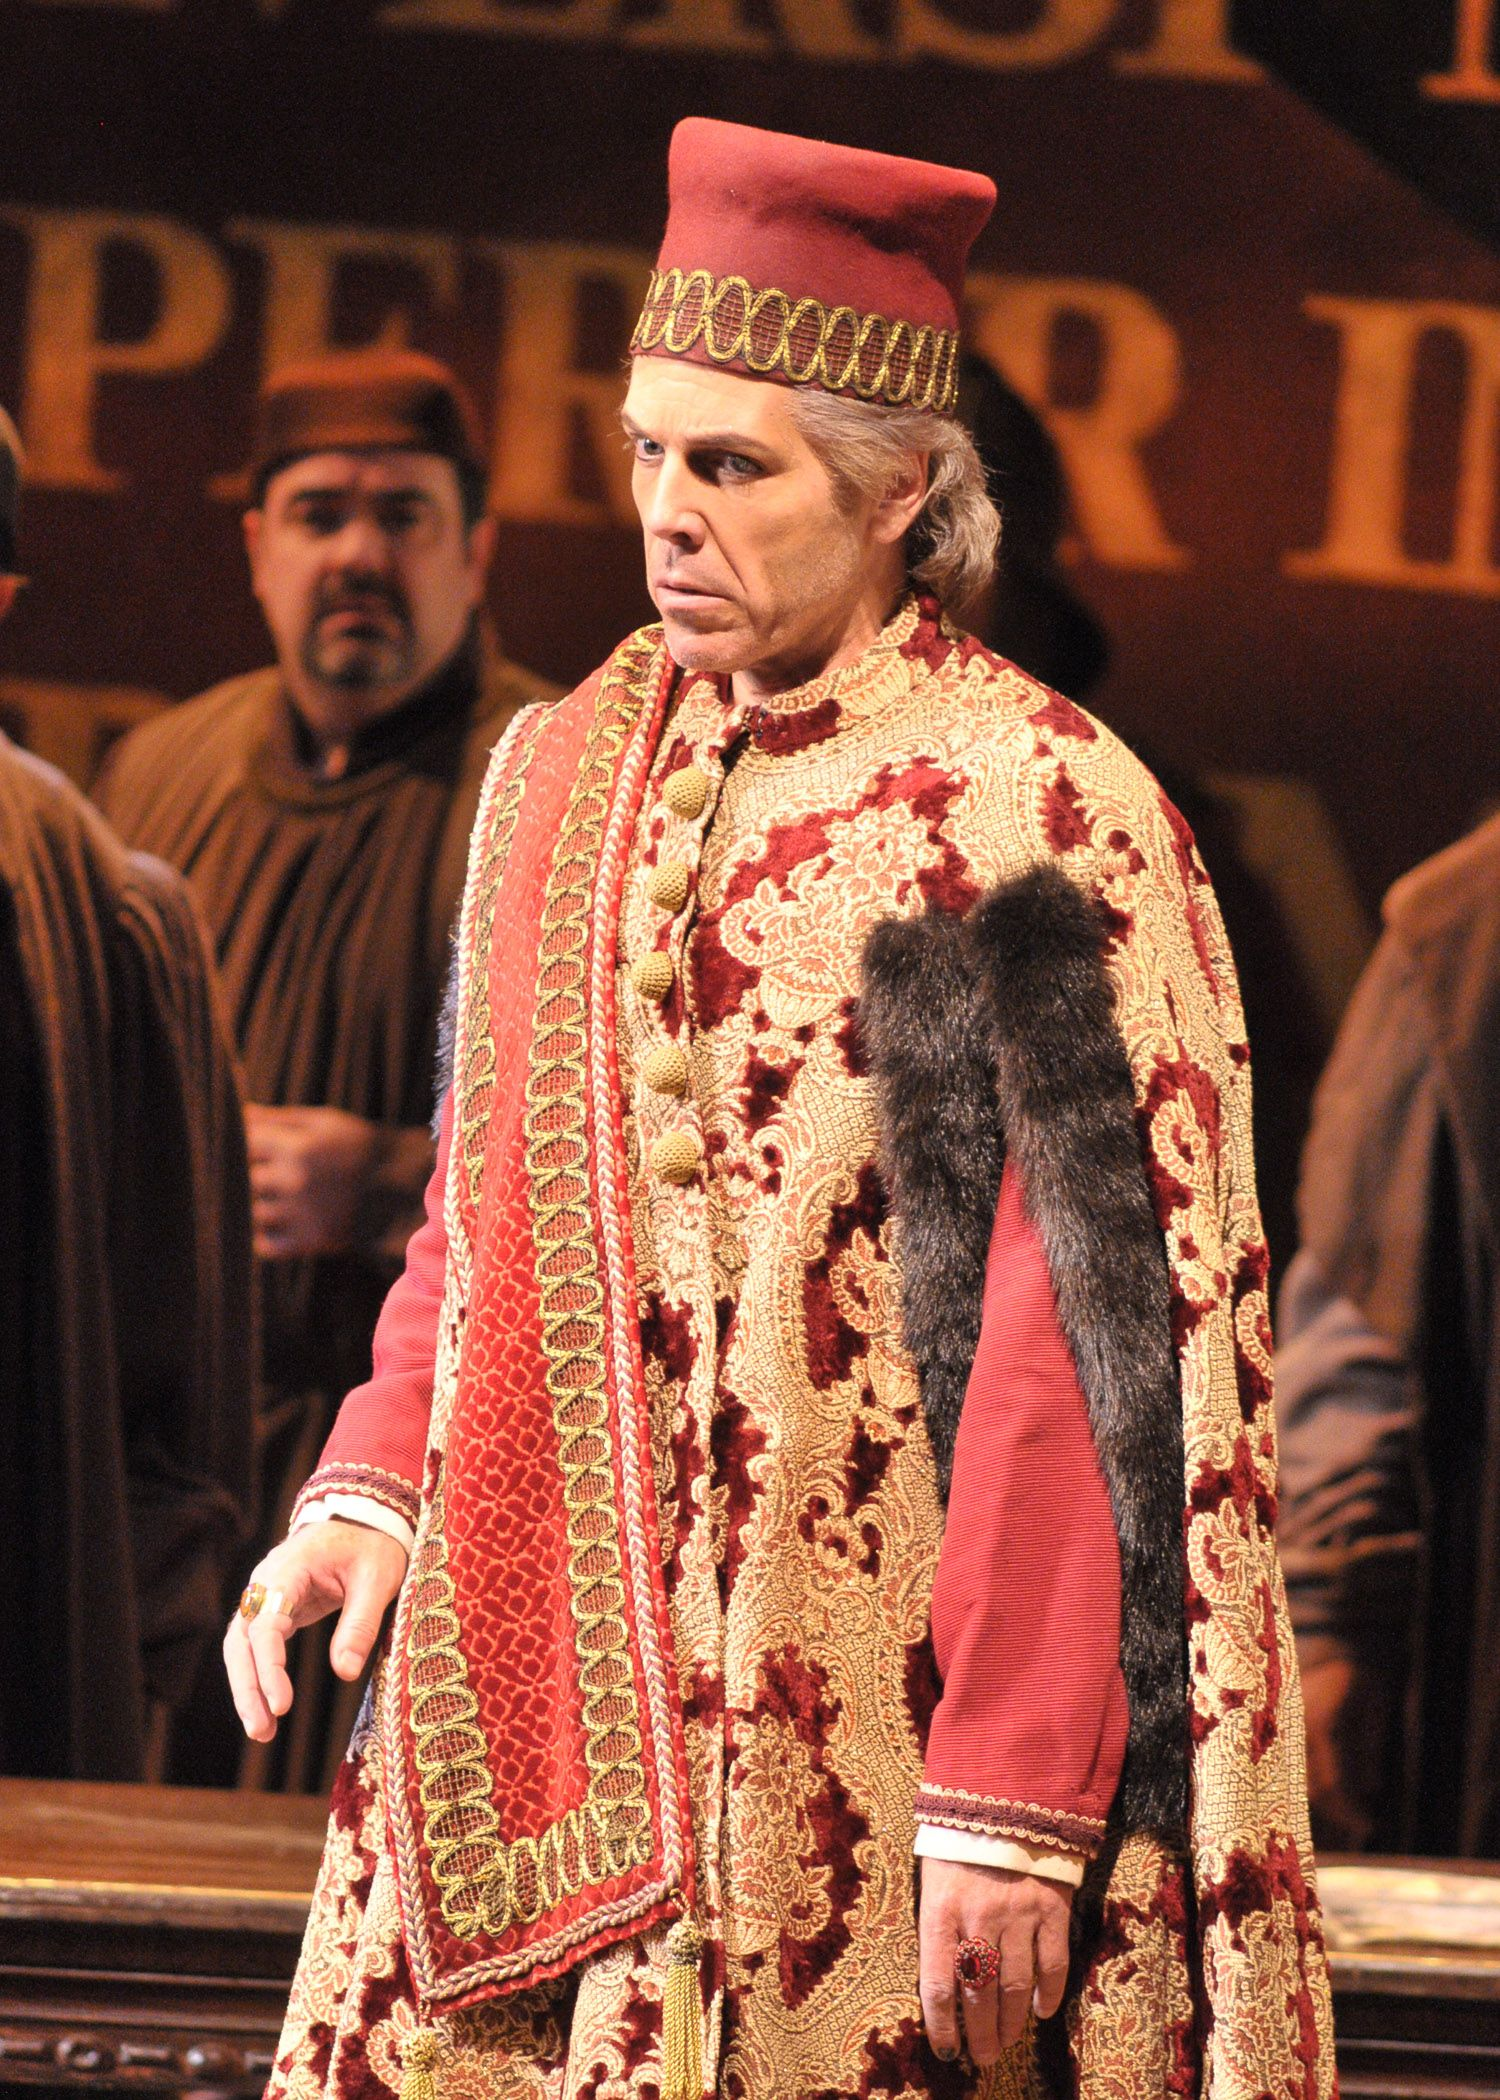 Giuseppe Verdi's #SimonBoccanegra at Lyric Opera of Chicago.  Photo by Dan Rest/Lyric Opera of Chicago. Thomas Hampson